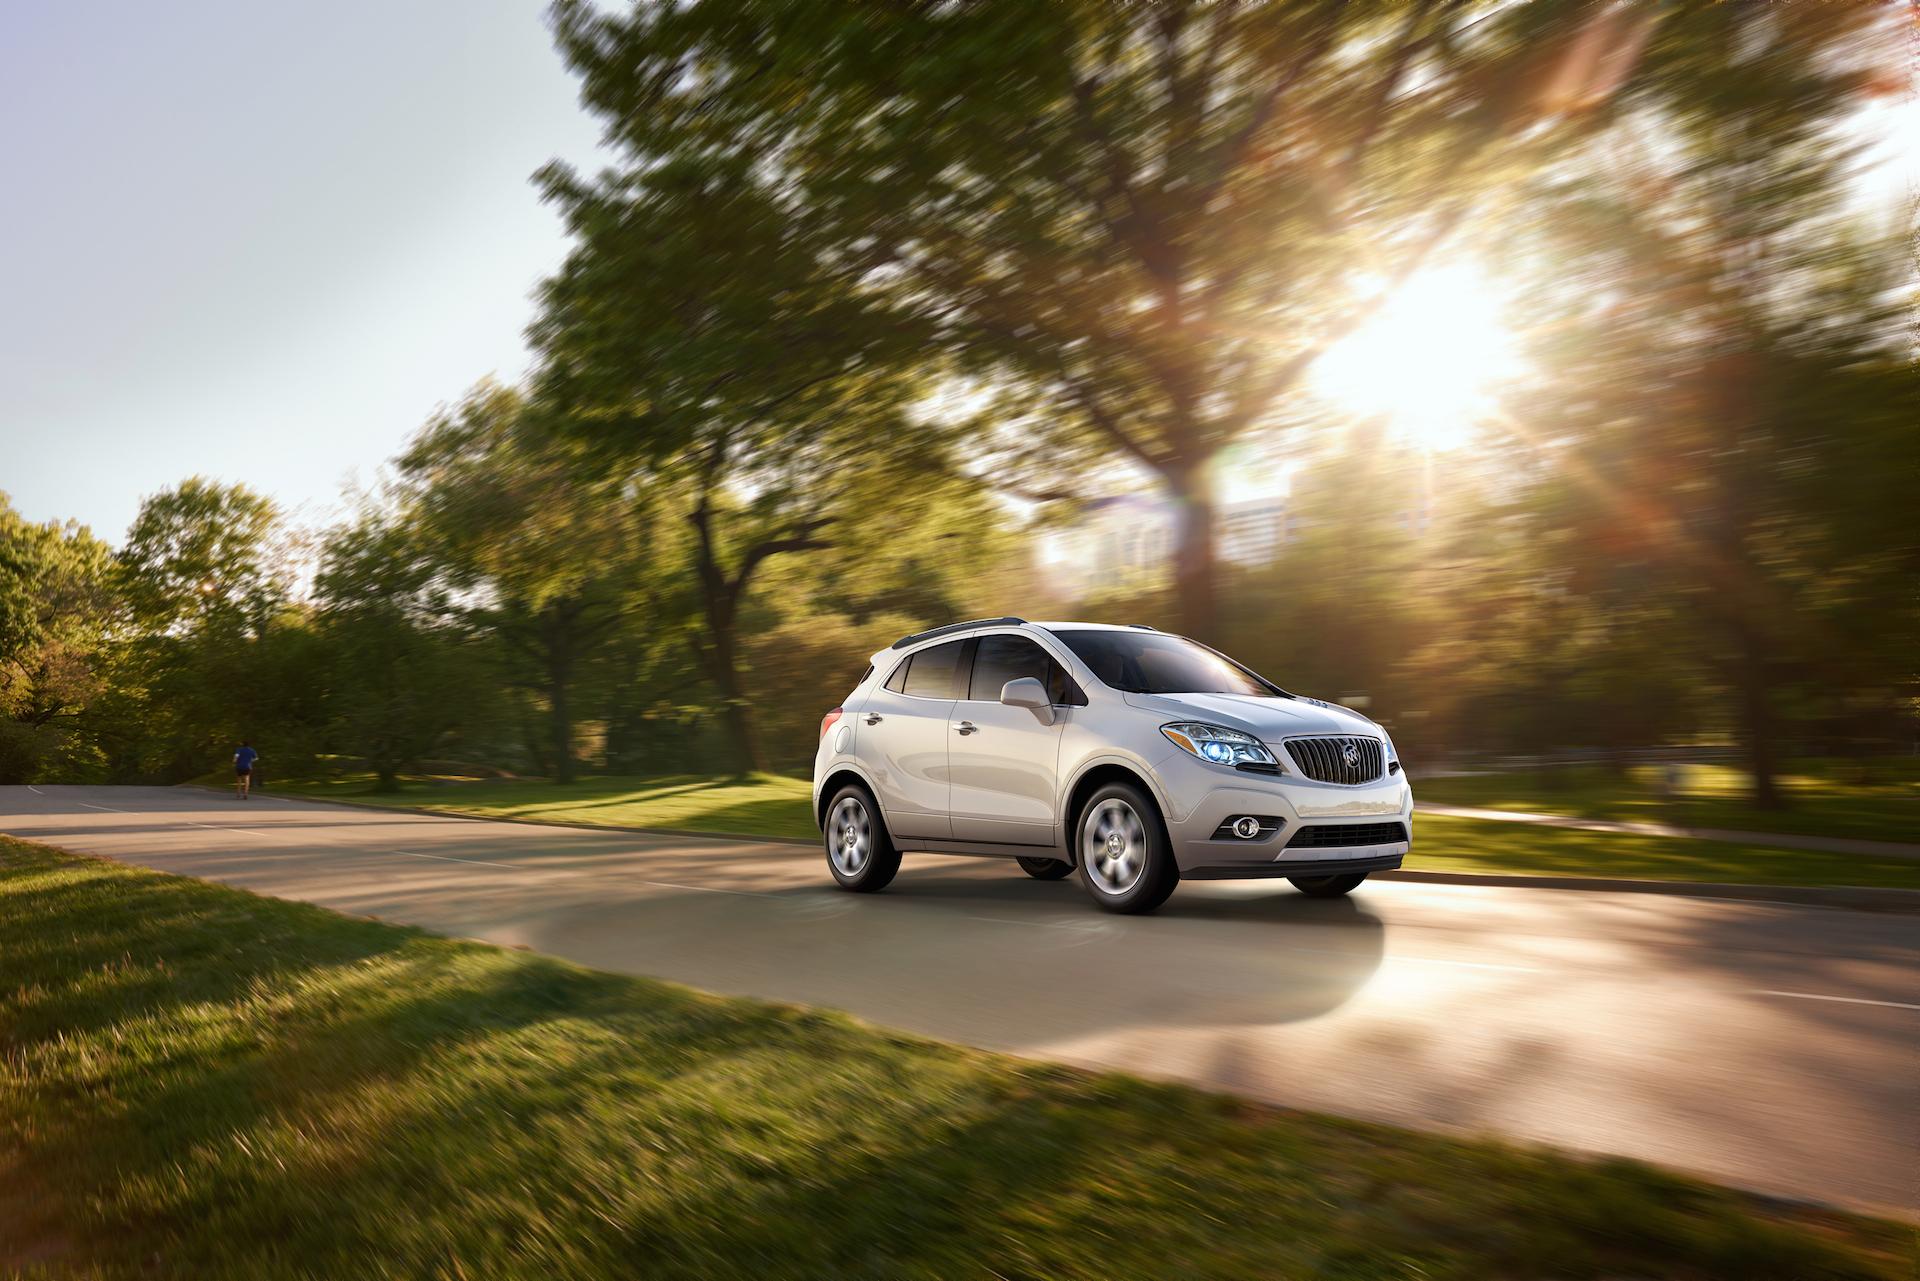 buick driver depth and reviews original car encore in s photo model review